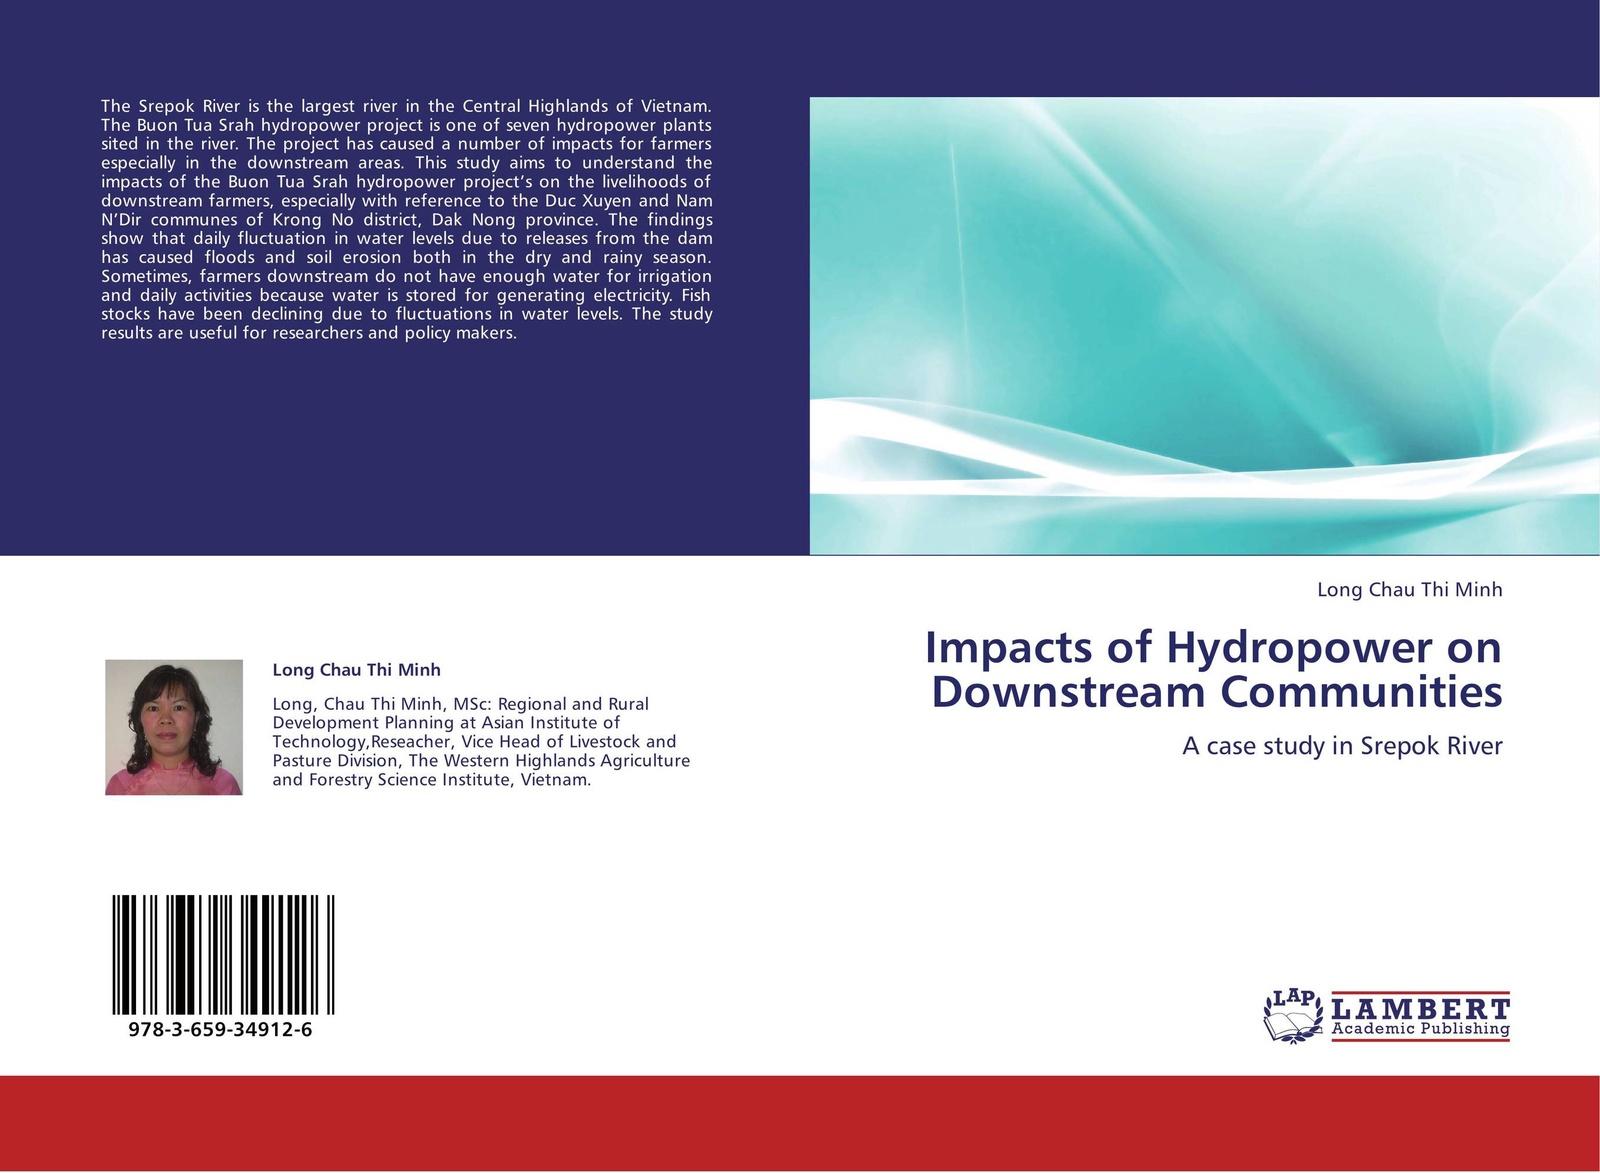 Long Chau Thi Minh Impacts of Hydropower on Downstream Communities